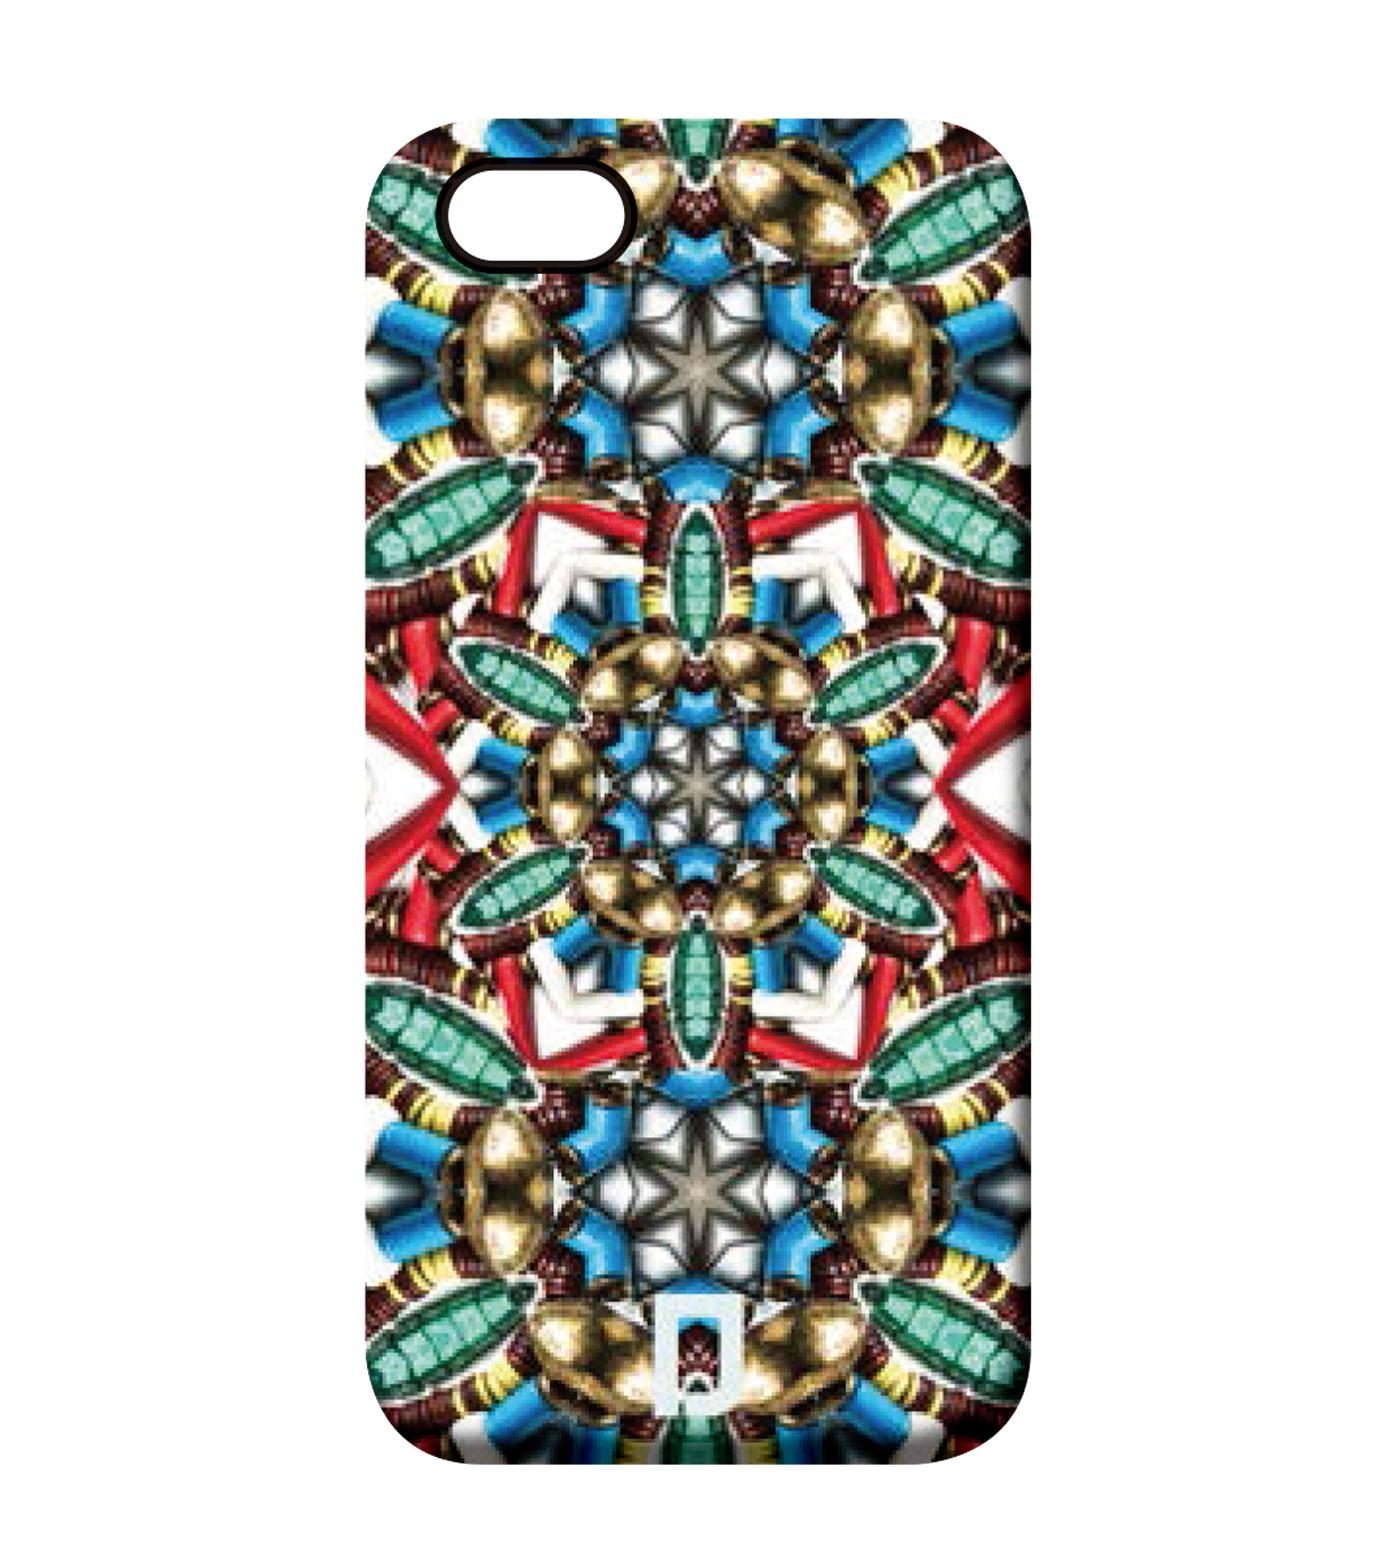 Dannijo(ダンニージョ)のiphone5 Case-MULTI COLOUR(ケースiphone5/5s/se/case iphone5/5s/se)-SAFFRON-9 拡大詳細画像1